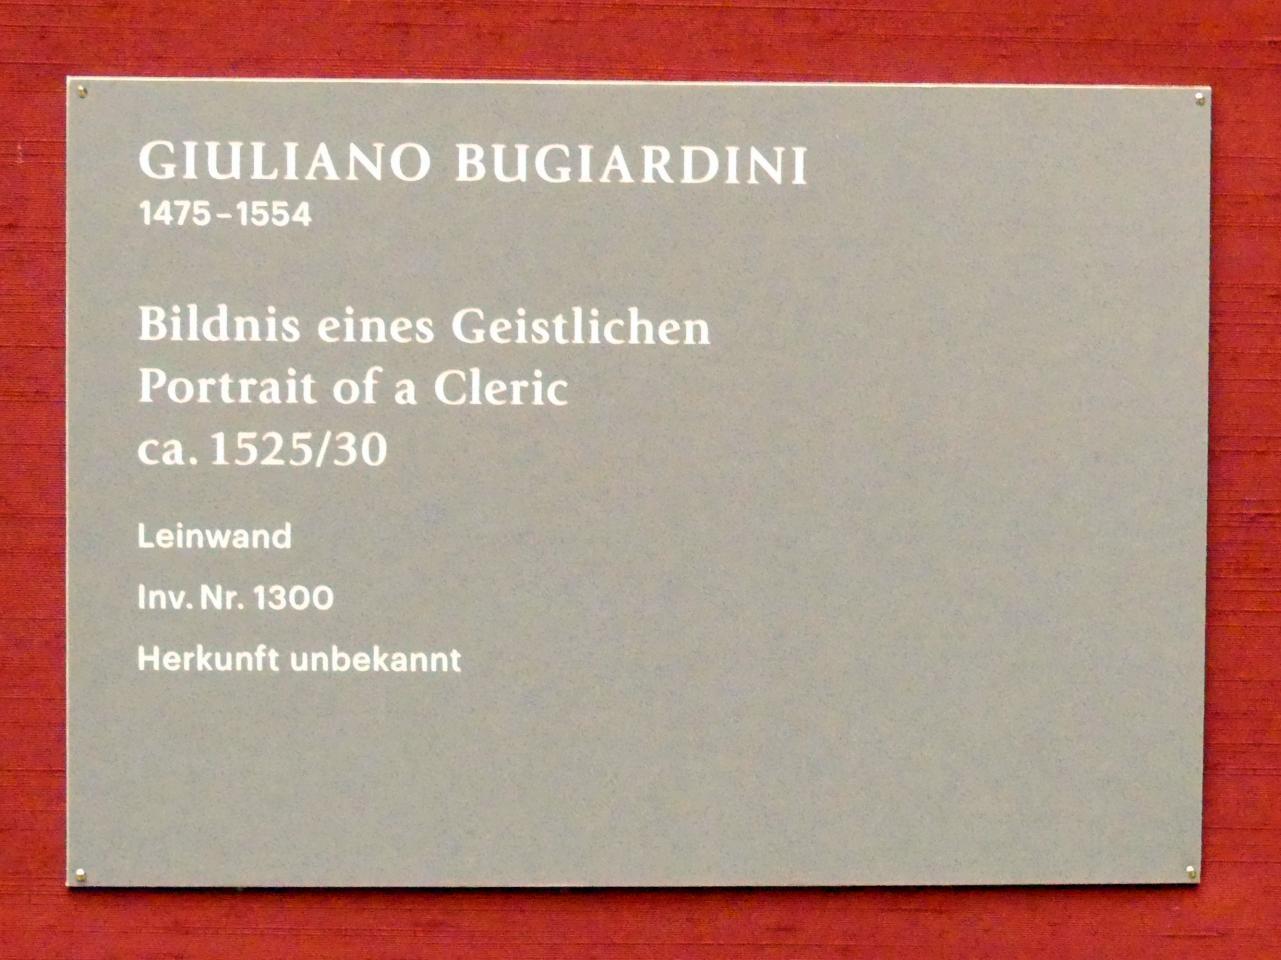 Giuliano Bugiardini: Bildnis eines Geistlichen, 1525 - 1530, Bild 2/2